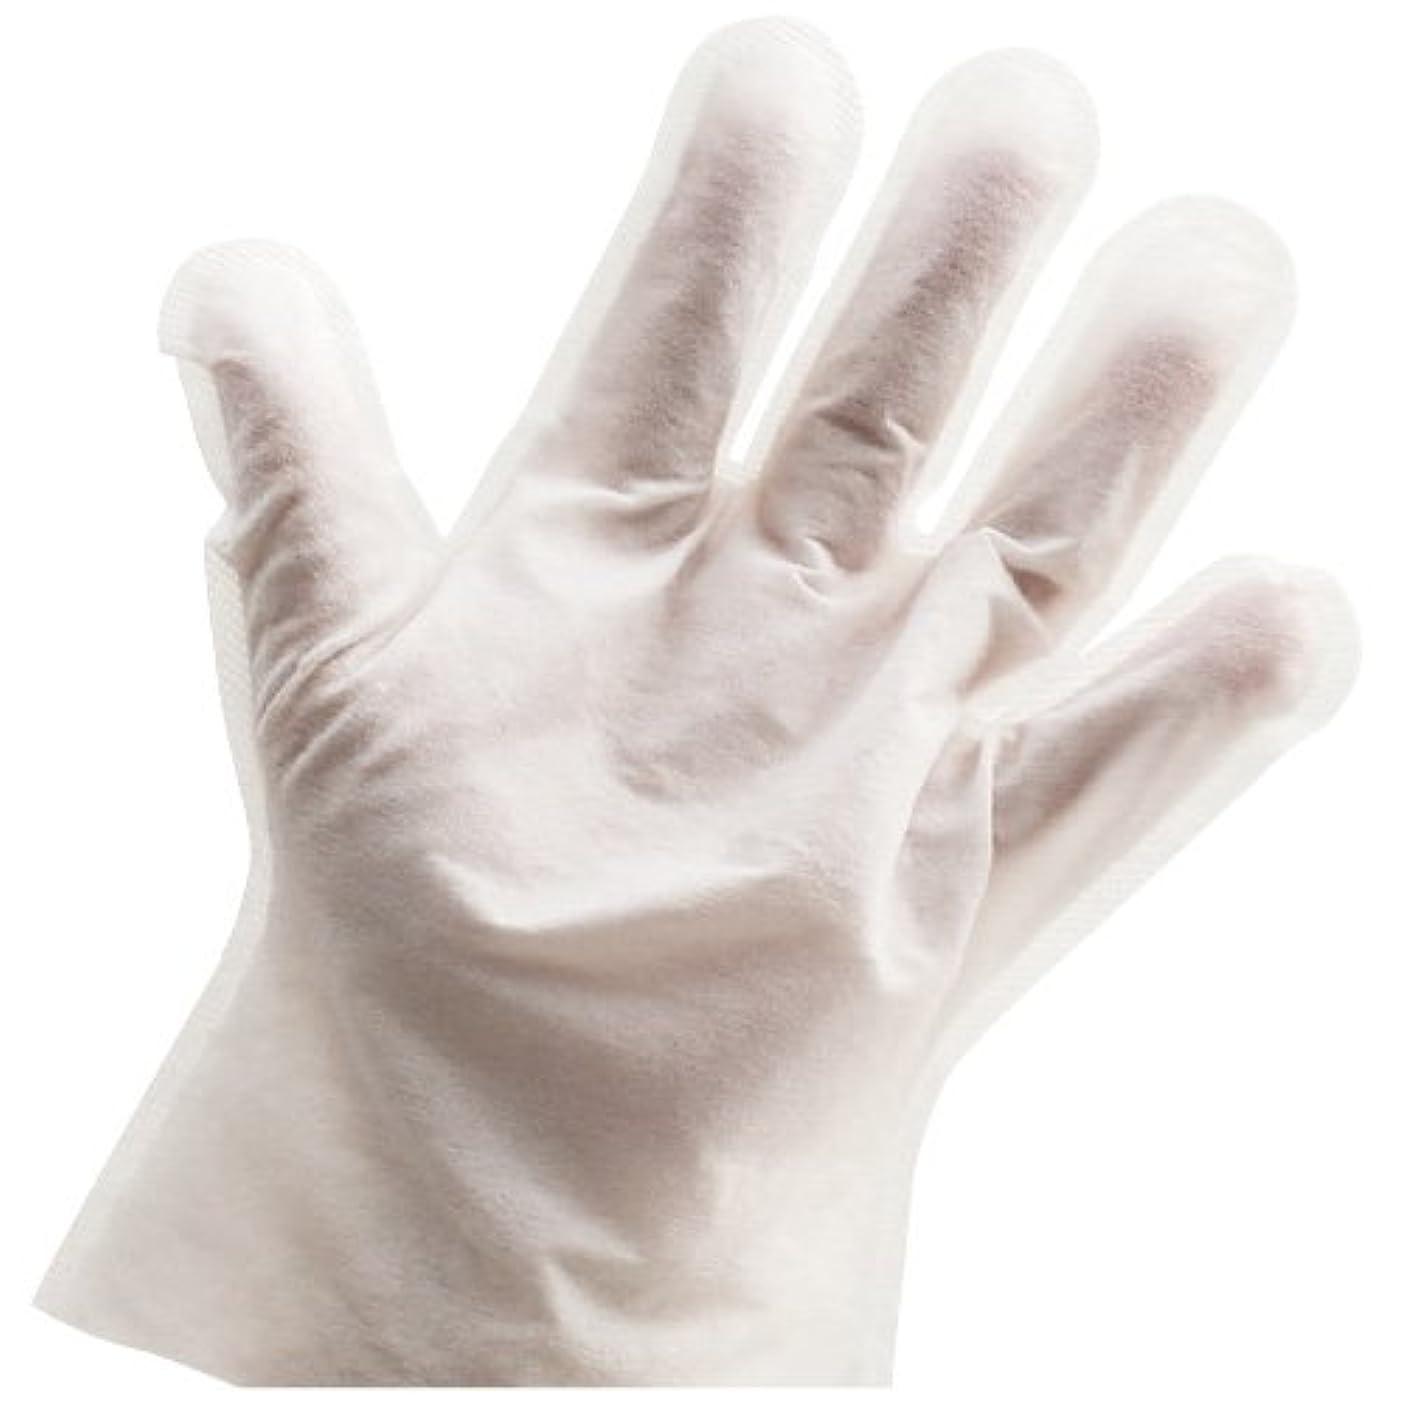 空港同一性シャンプー手袋 107405(2??) ???????????(24-4902-00)【小津産業】[80袋単位]